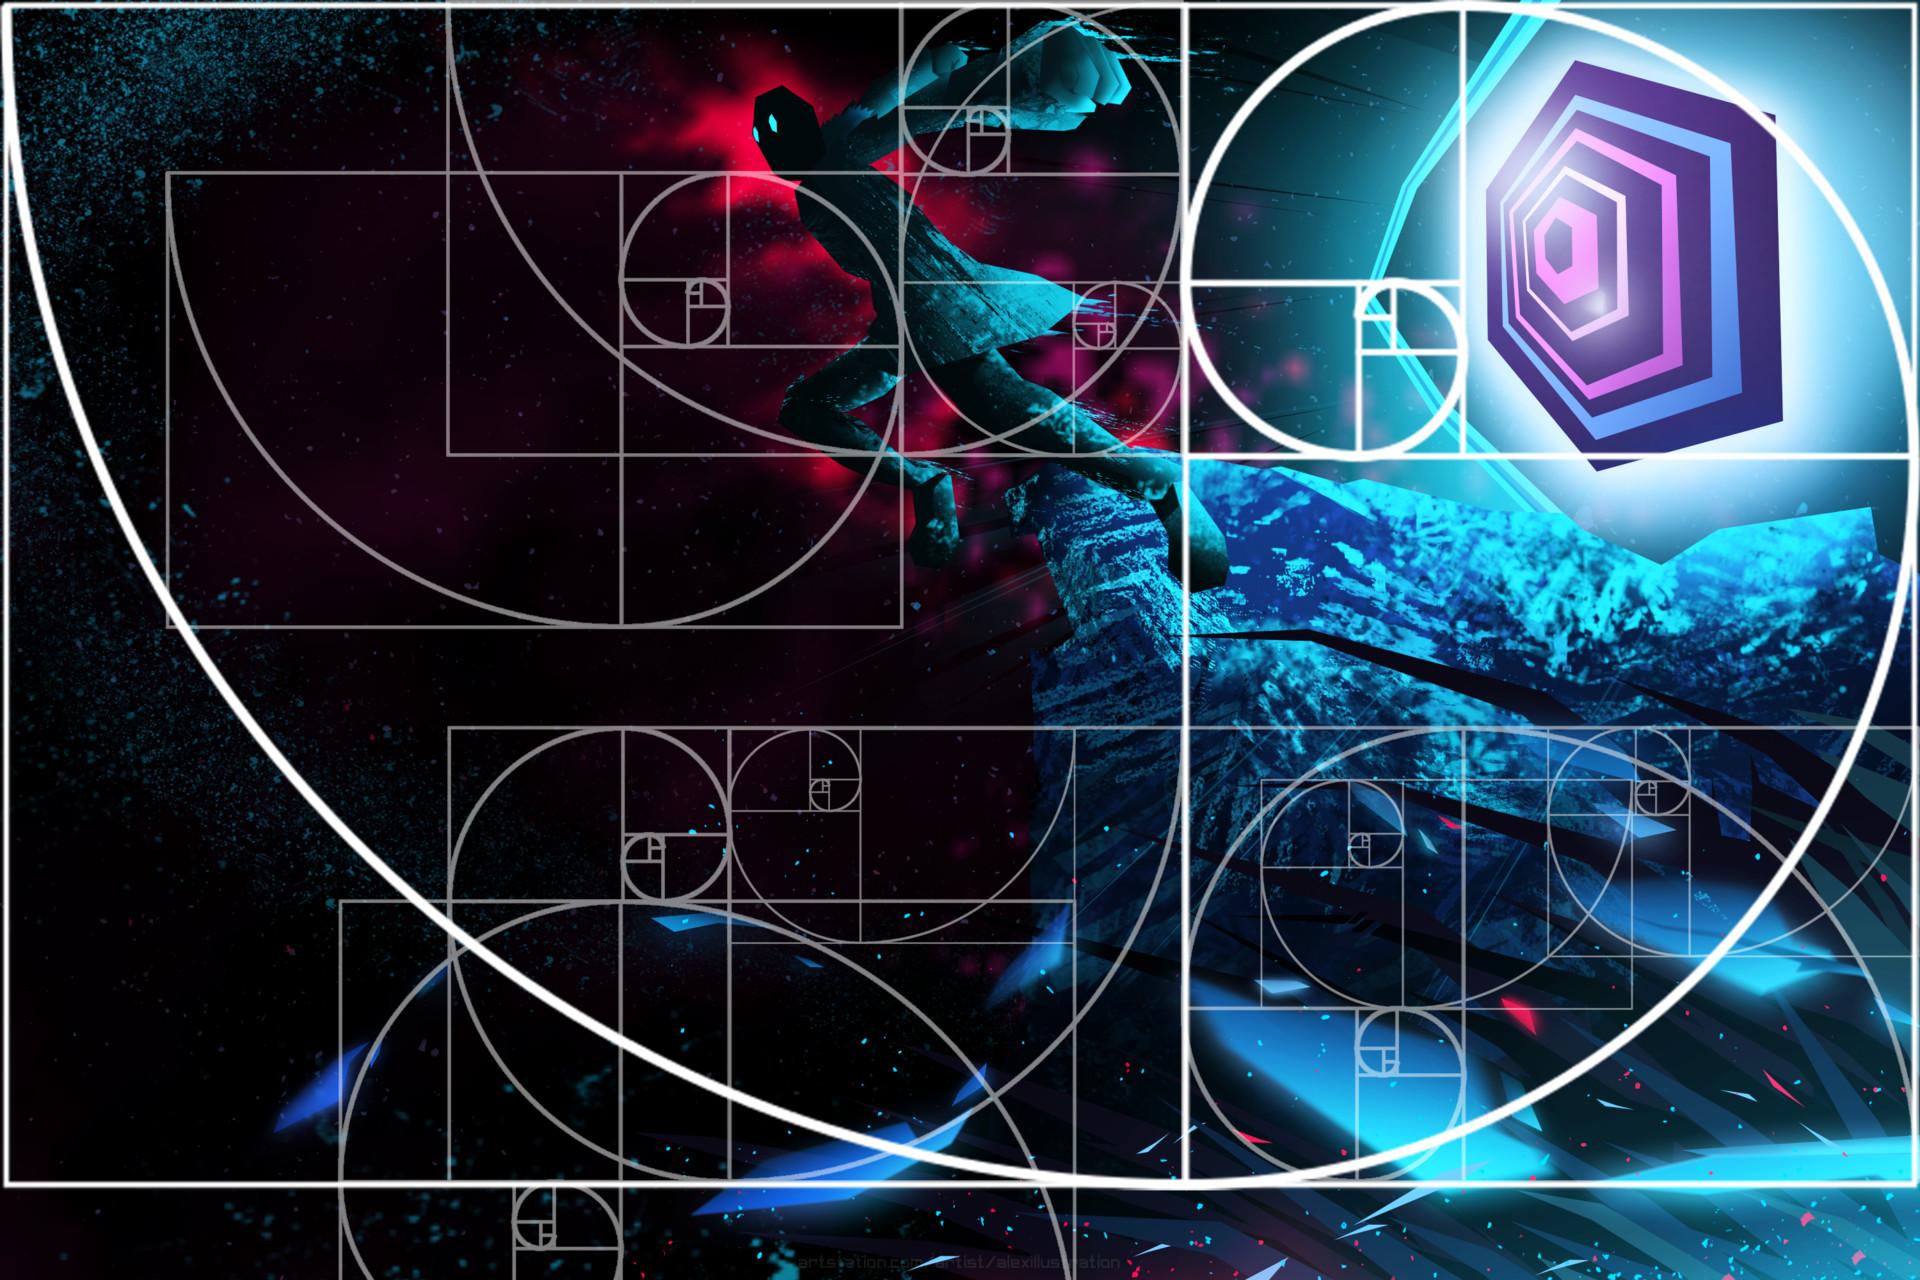 Composition [Fibonacci sequence]